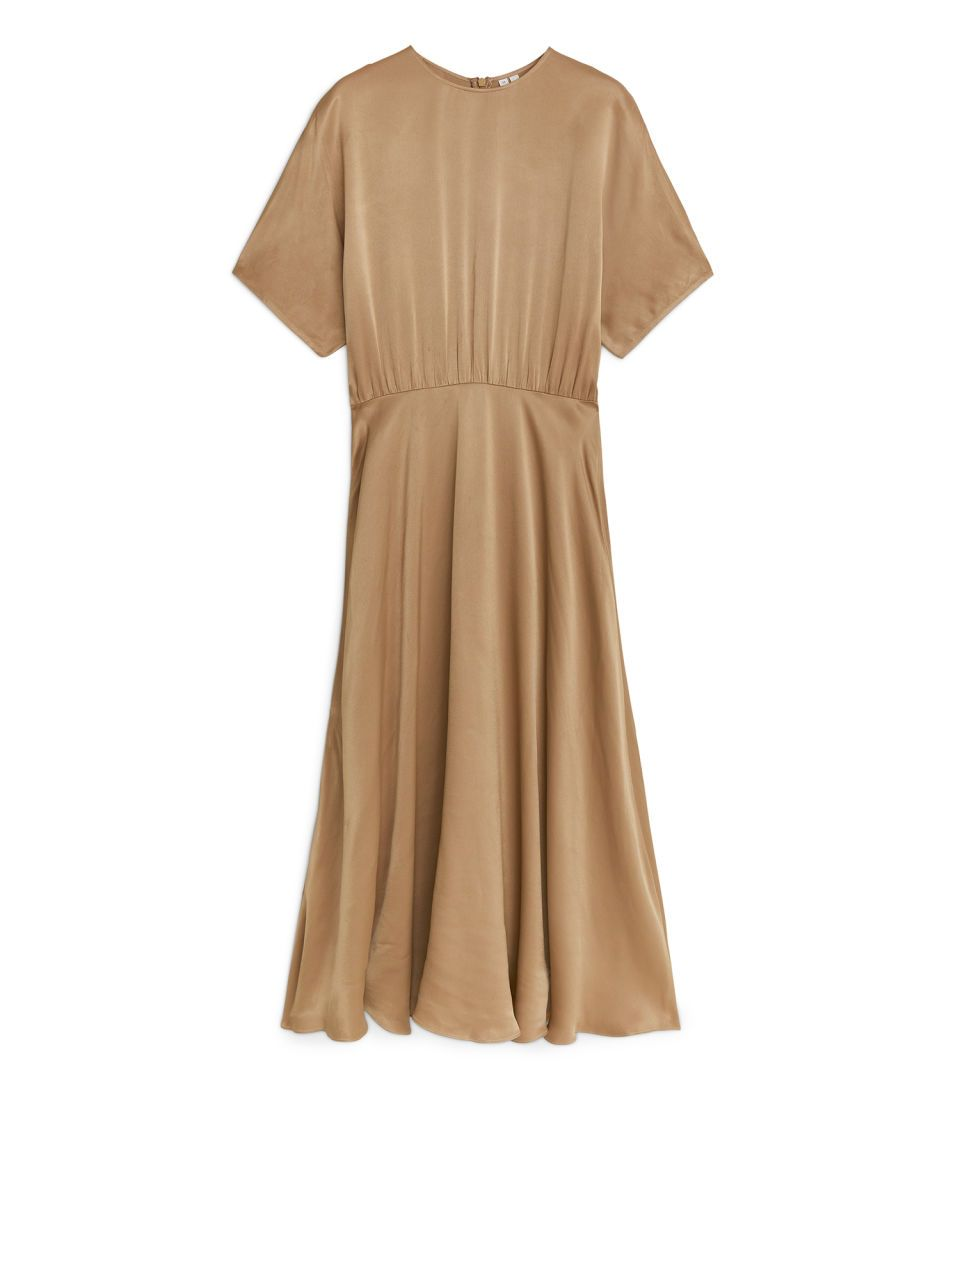 90fa64a171b2e Satin Fluted Dress - Beige - Dresses - ARKET IE in 2018